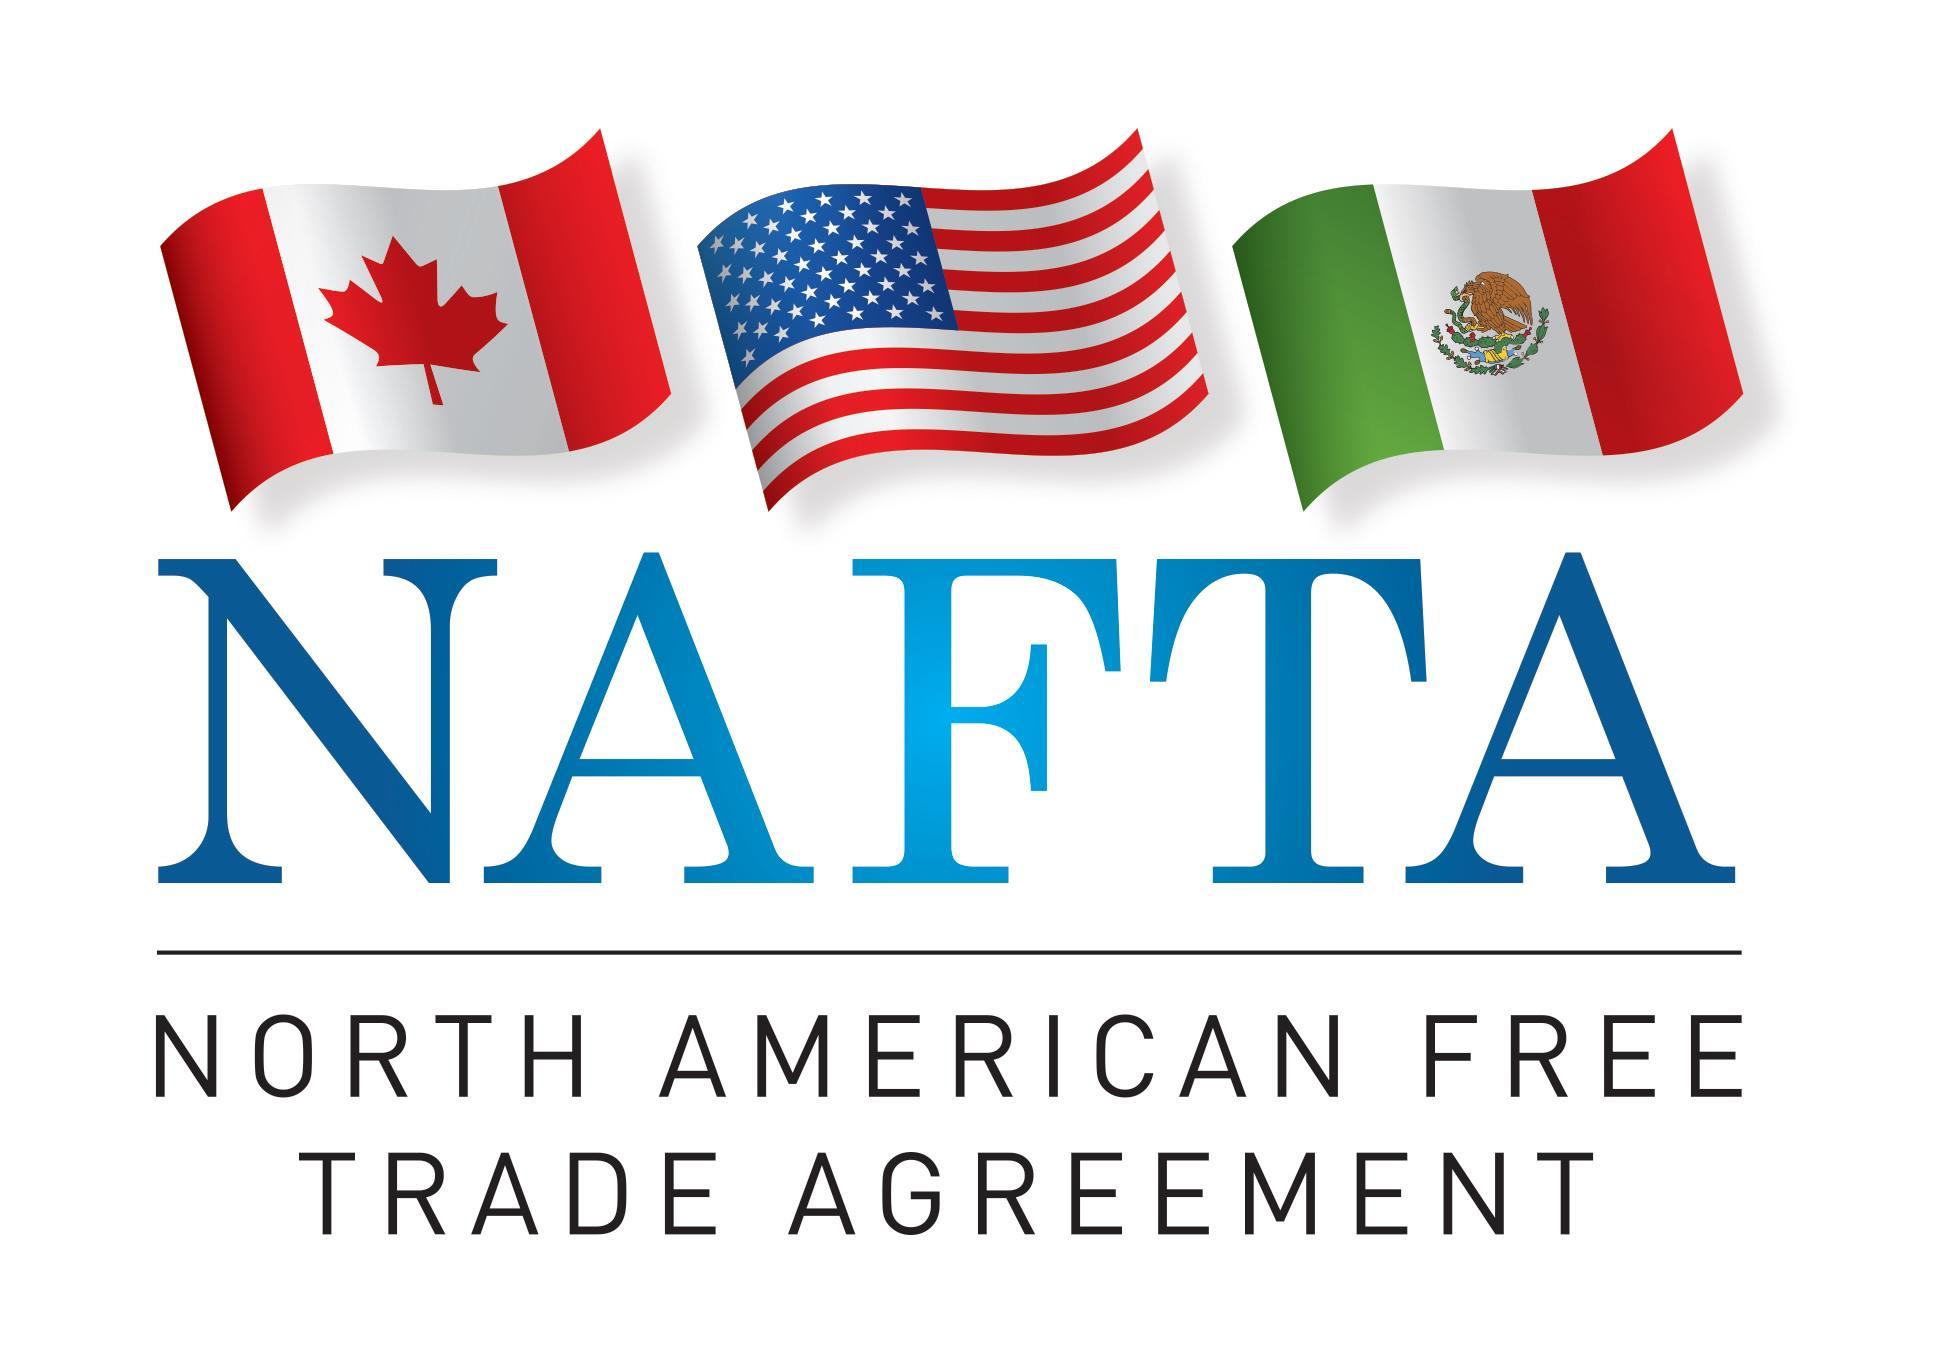 NAFTA, Trump administration, U.S. Chamber of Commerce, cross-border trade, tariffs, US manufacturing, Robert Lighthizer, Mark Zandi, tax cuts, CFM Federal Affairs